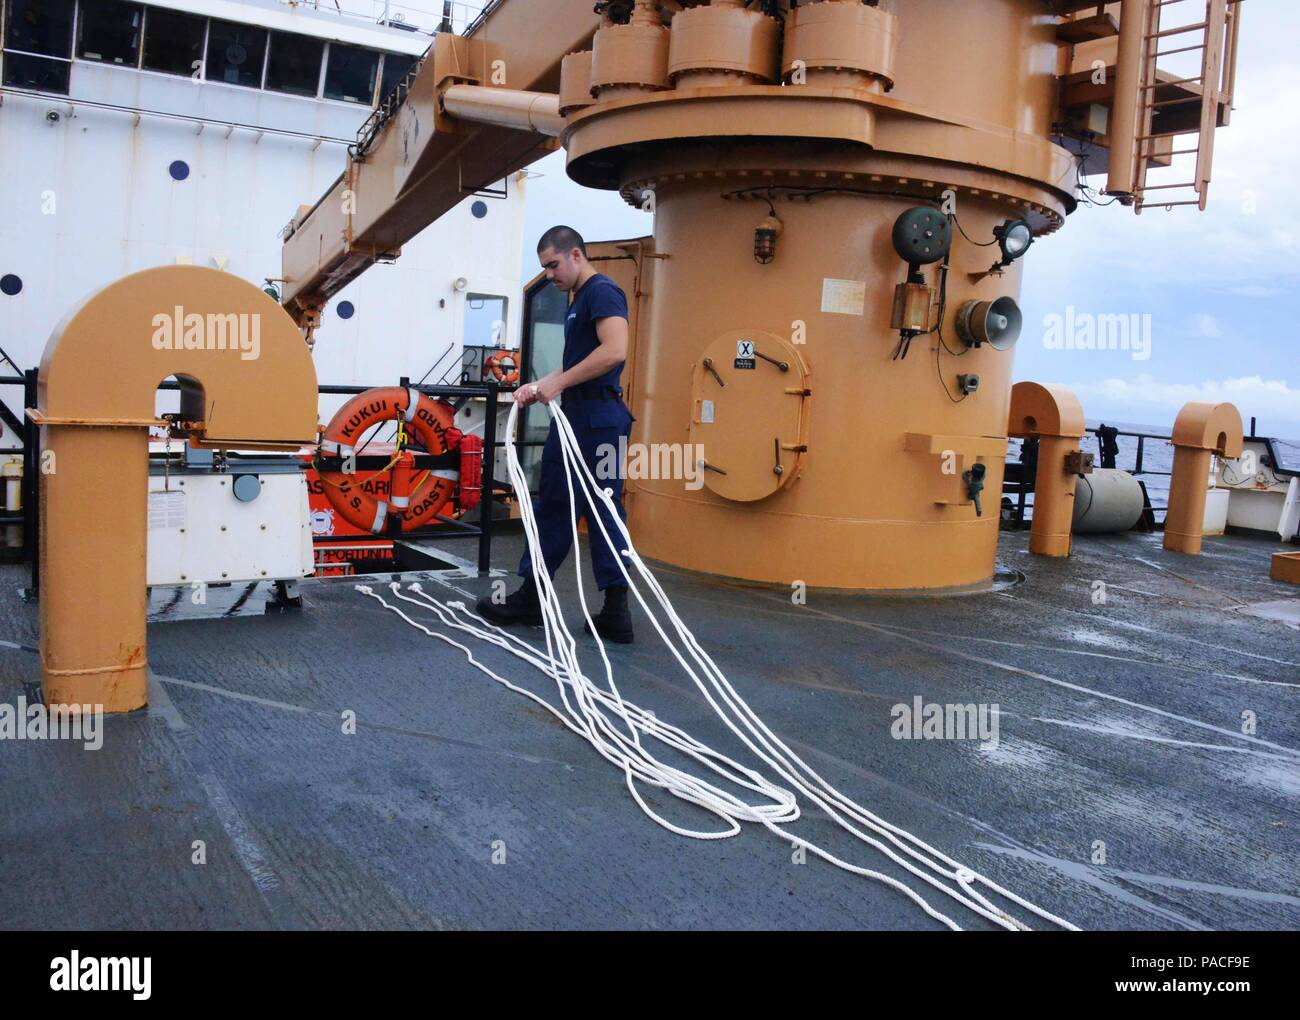 Seaman Apprentice Stockfotos & Seaman Apprentice Bilder - Alamy